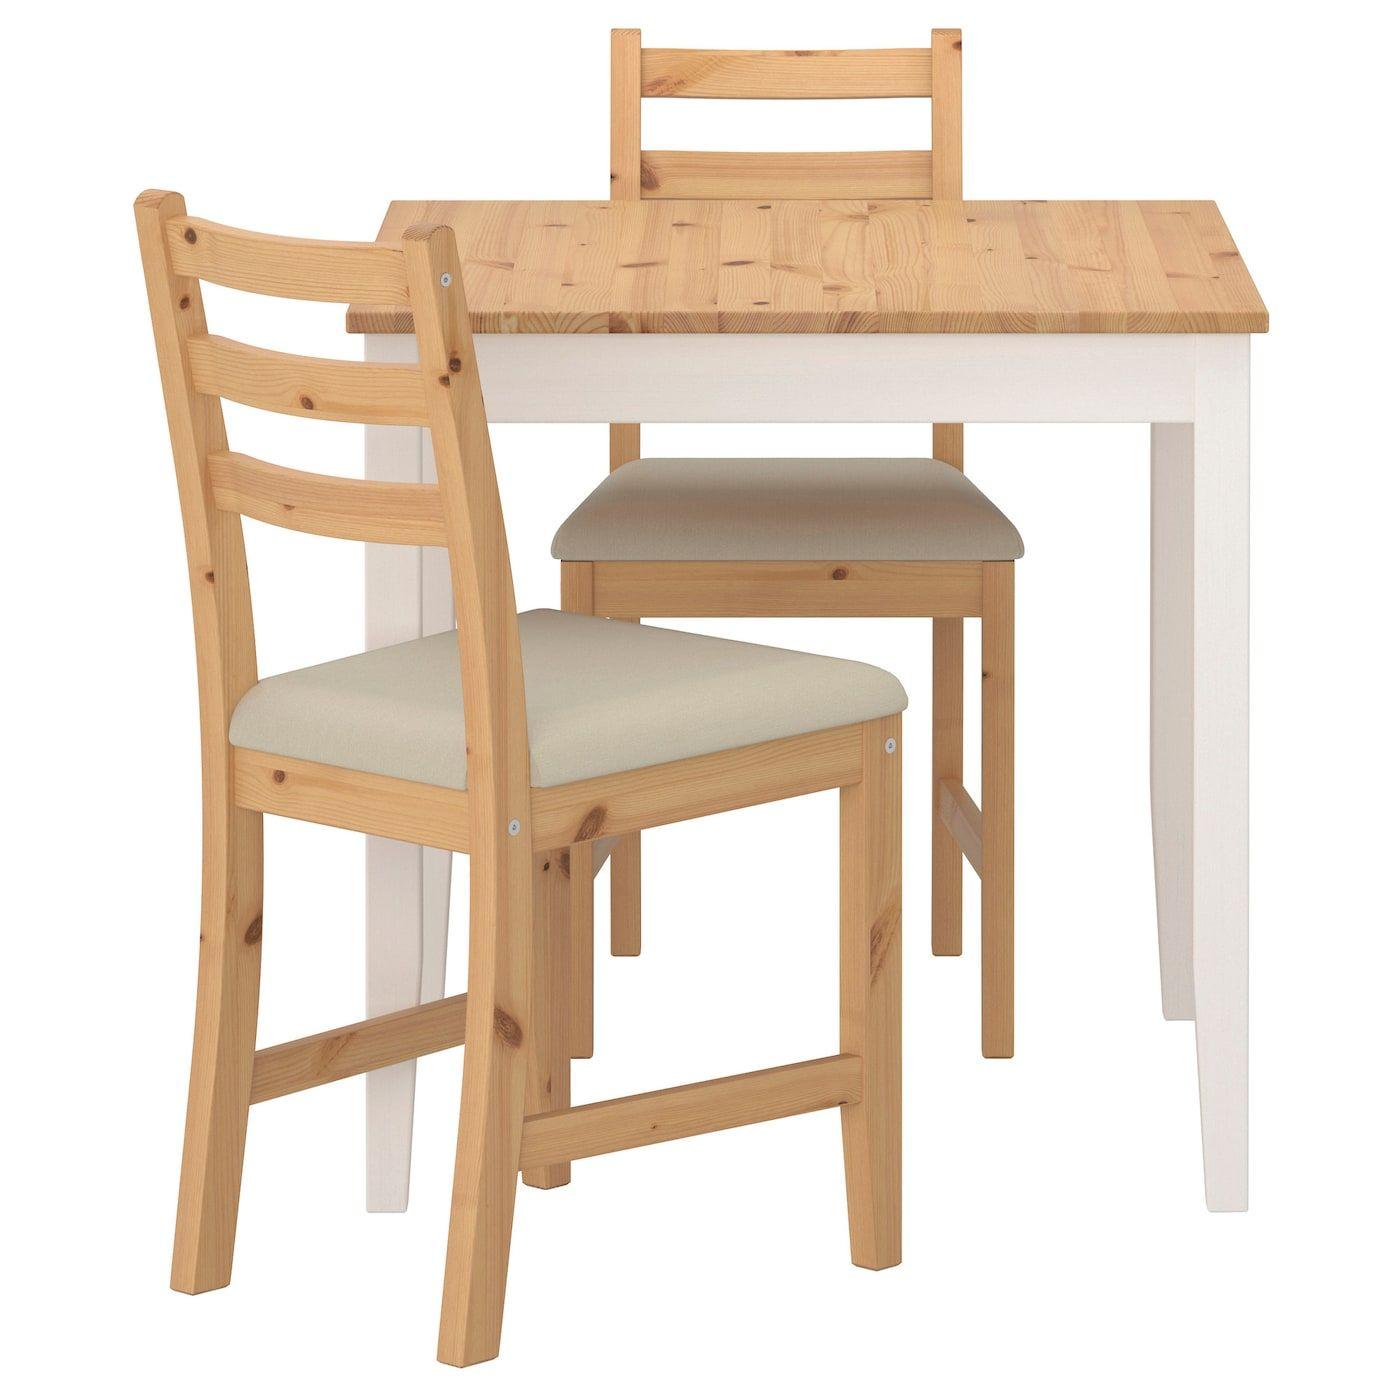 Ikea Us Furniture And Home Furnishings Ikea Dining Table Set